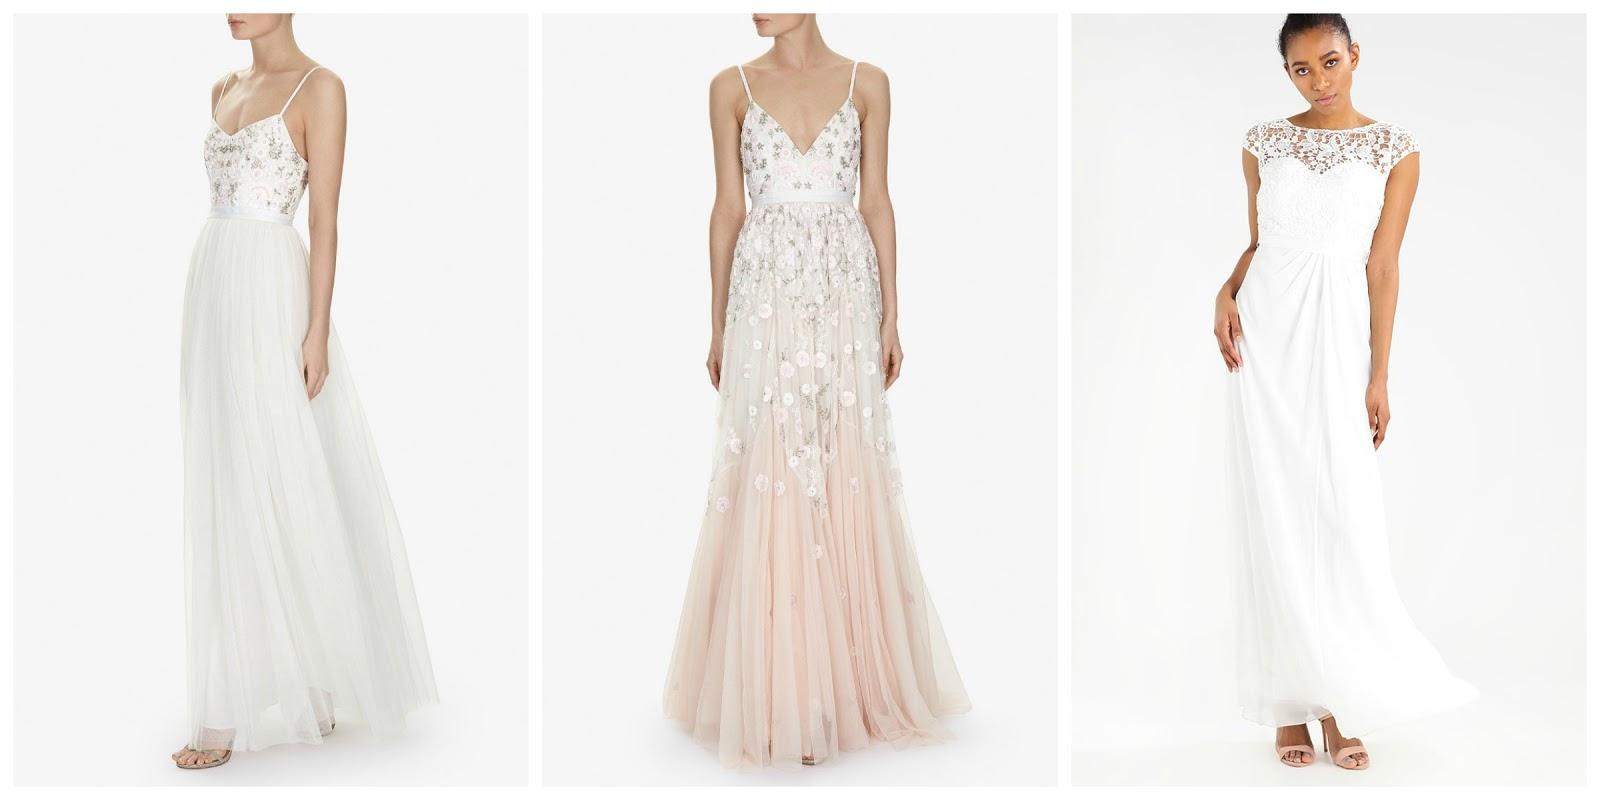 Vestidos de novia low cost guipuzcoa